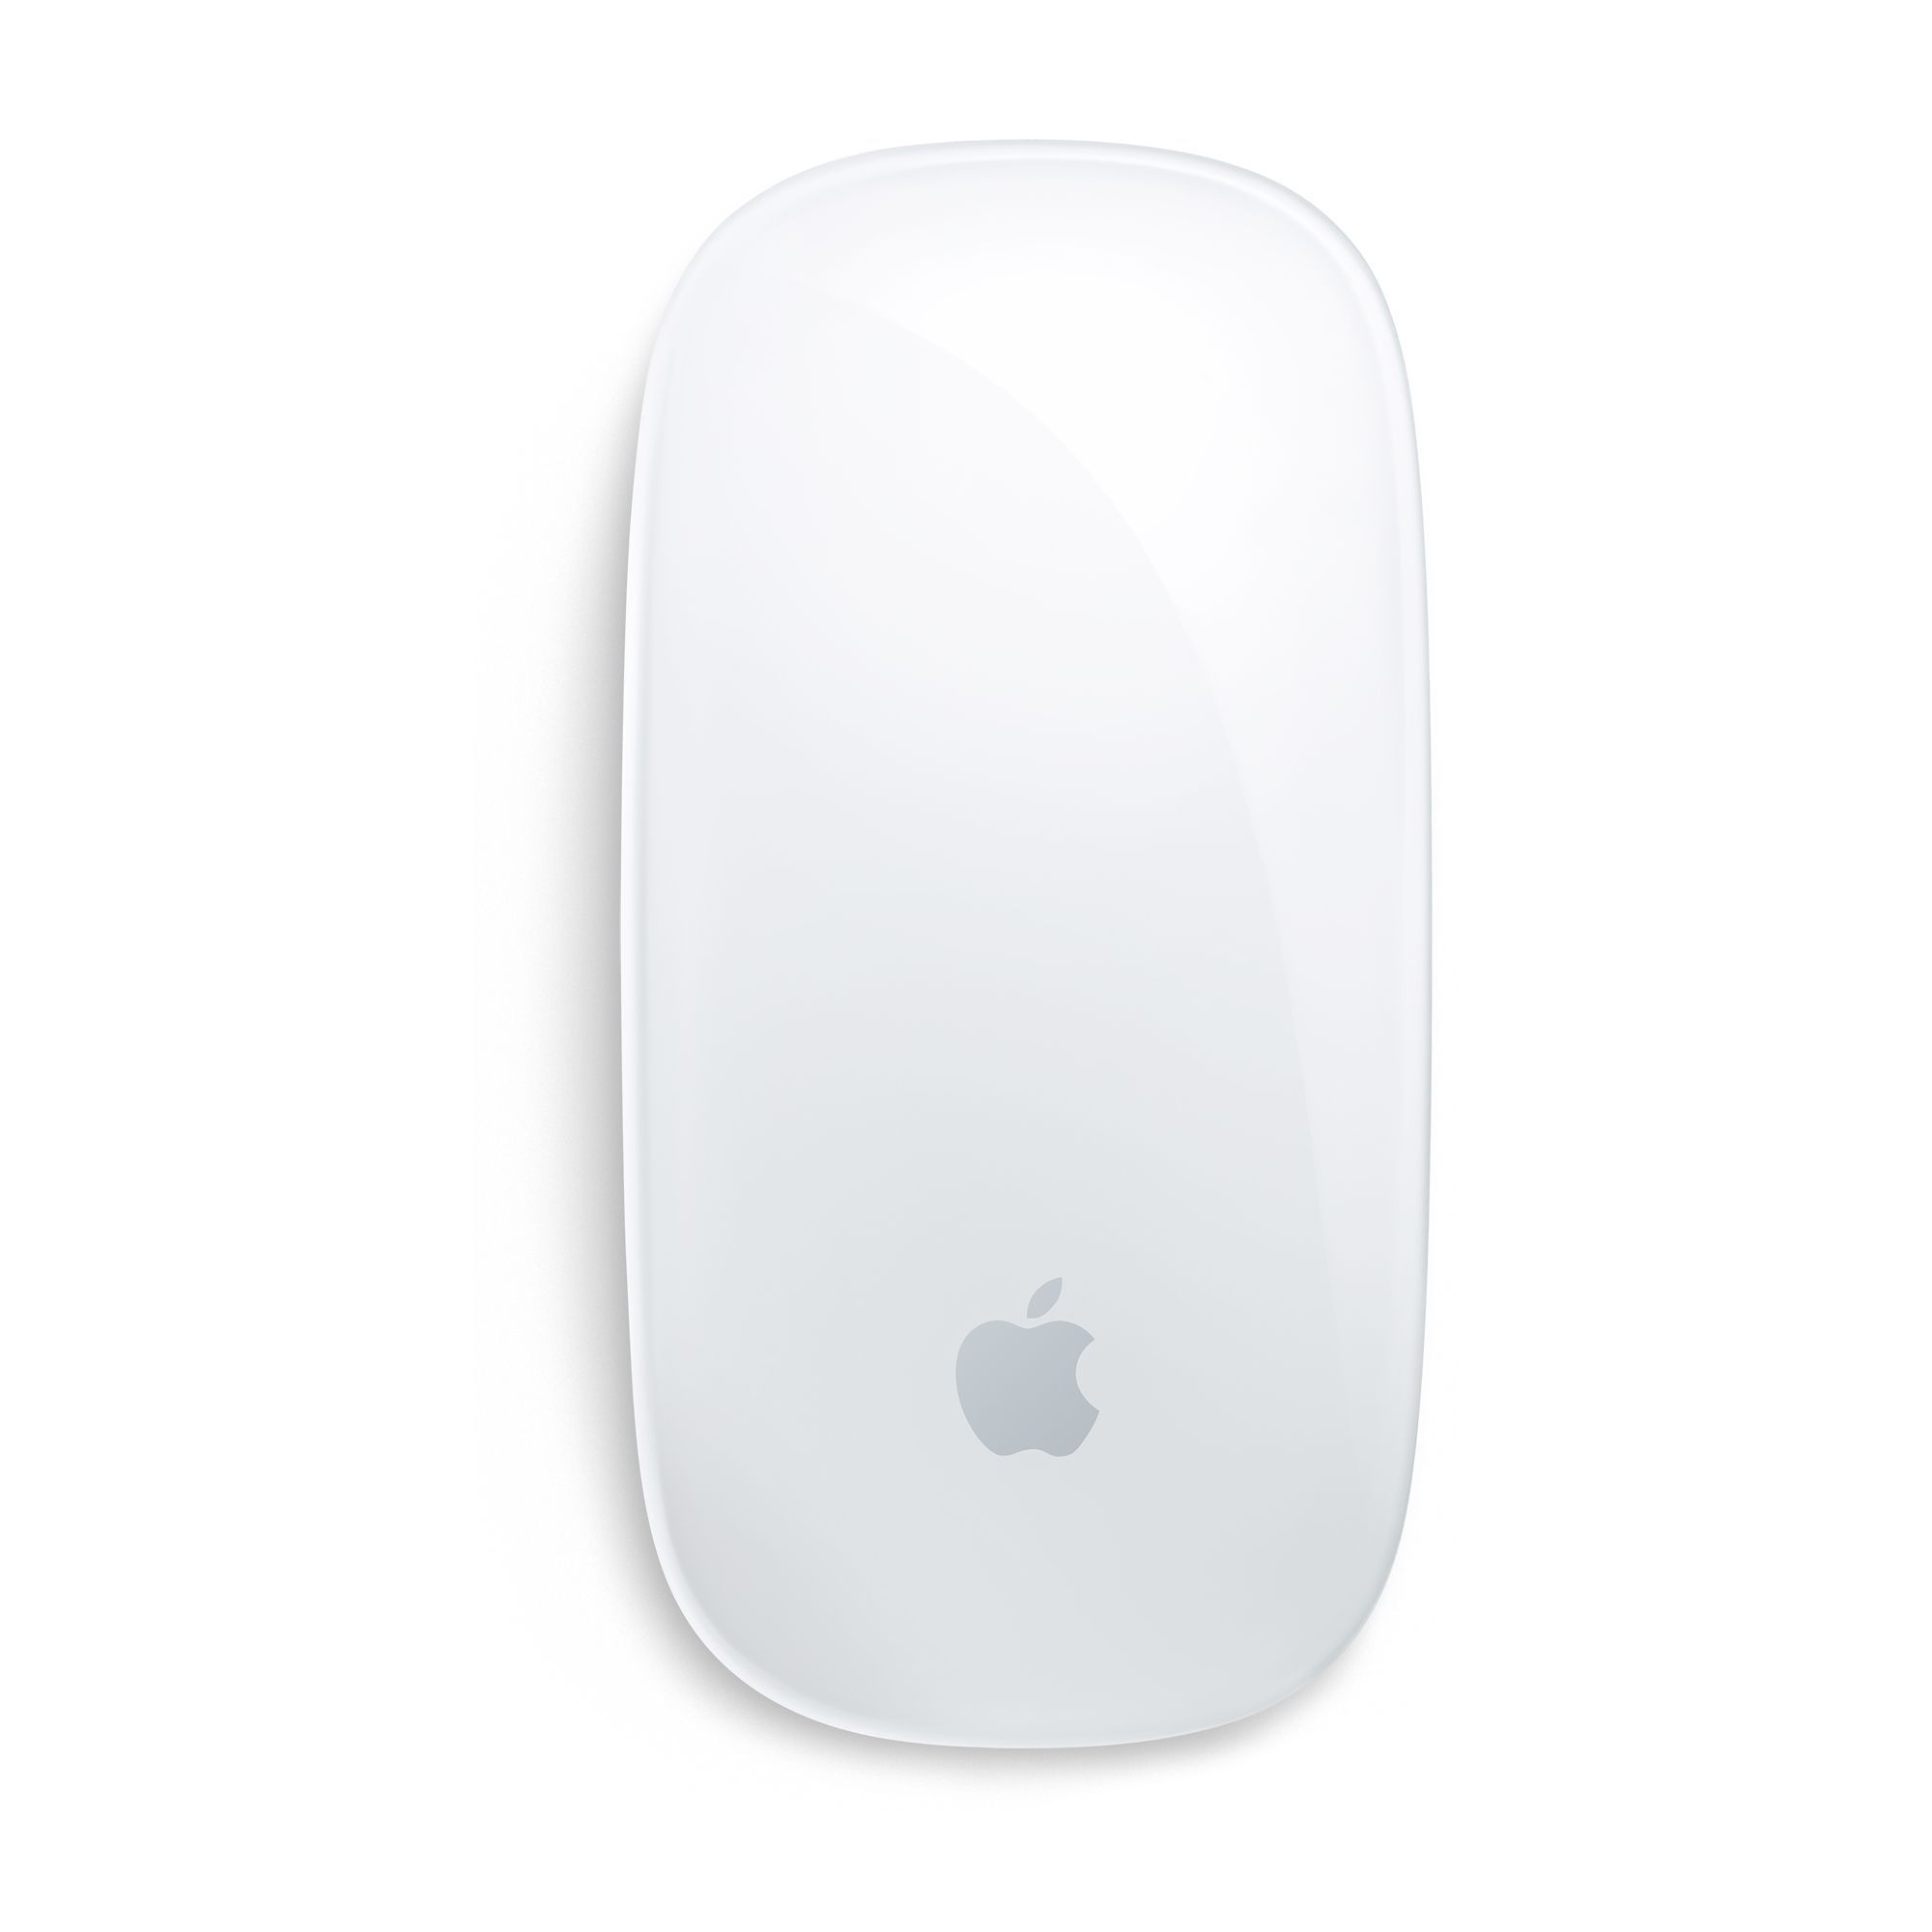 Apple Magic Mouse Macbook pro accessories, Macbook air